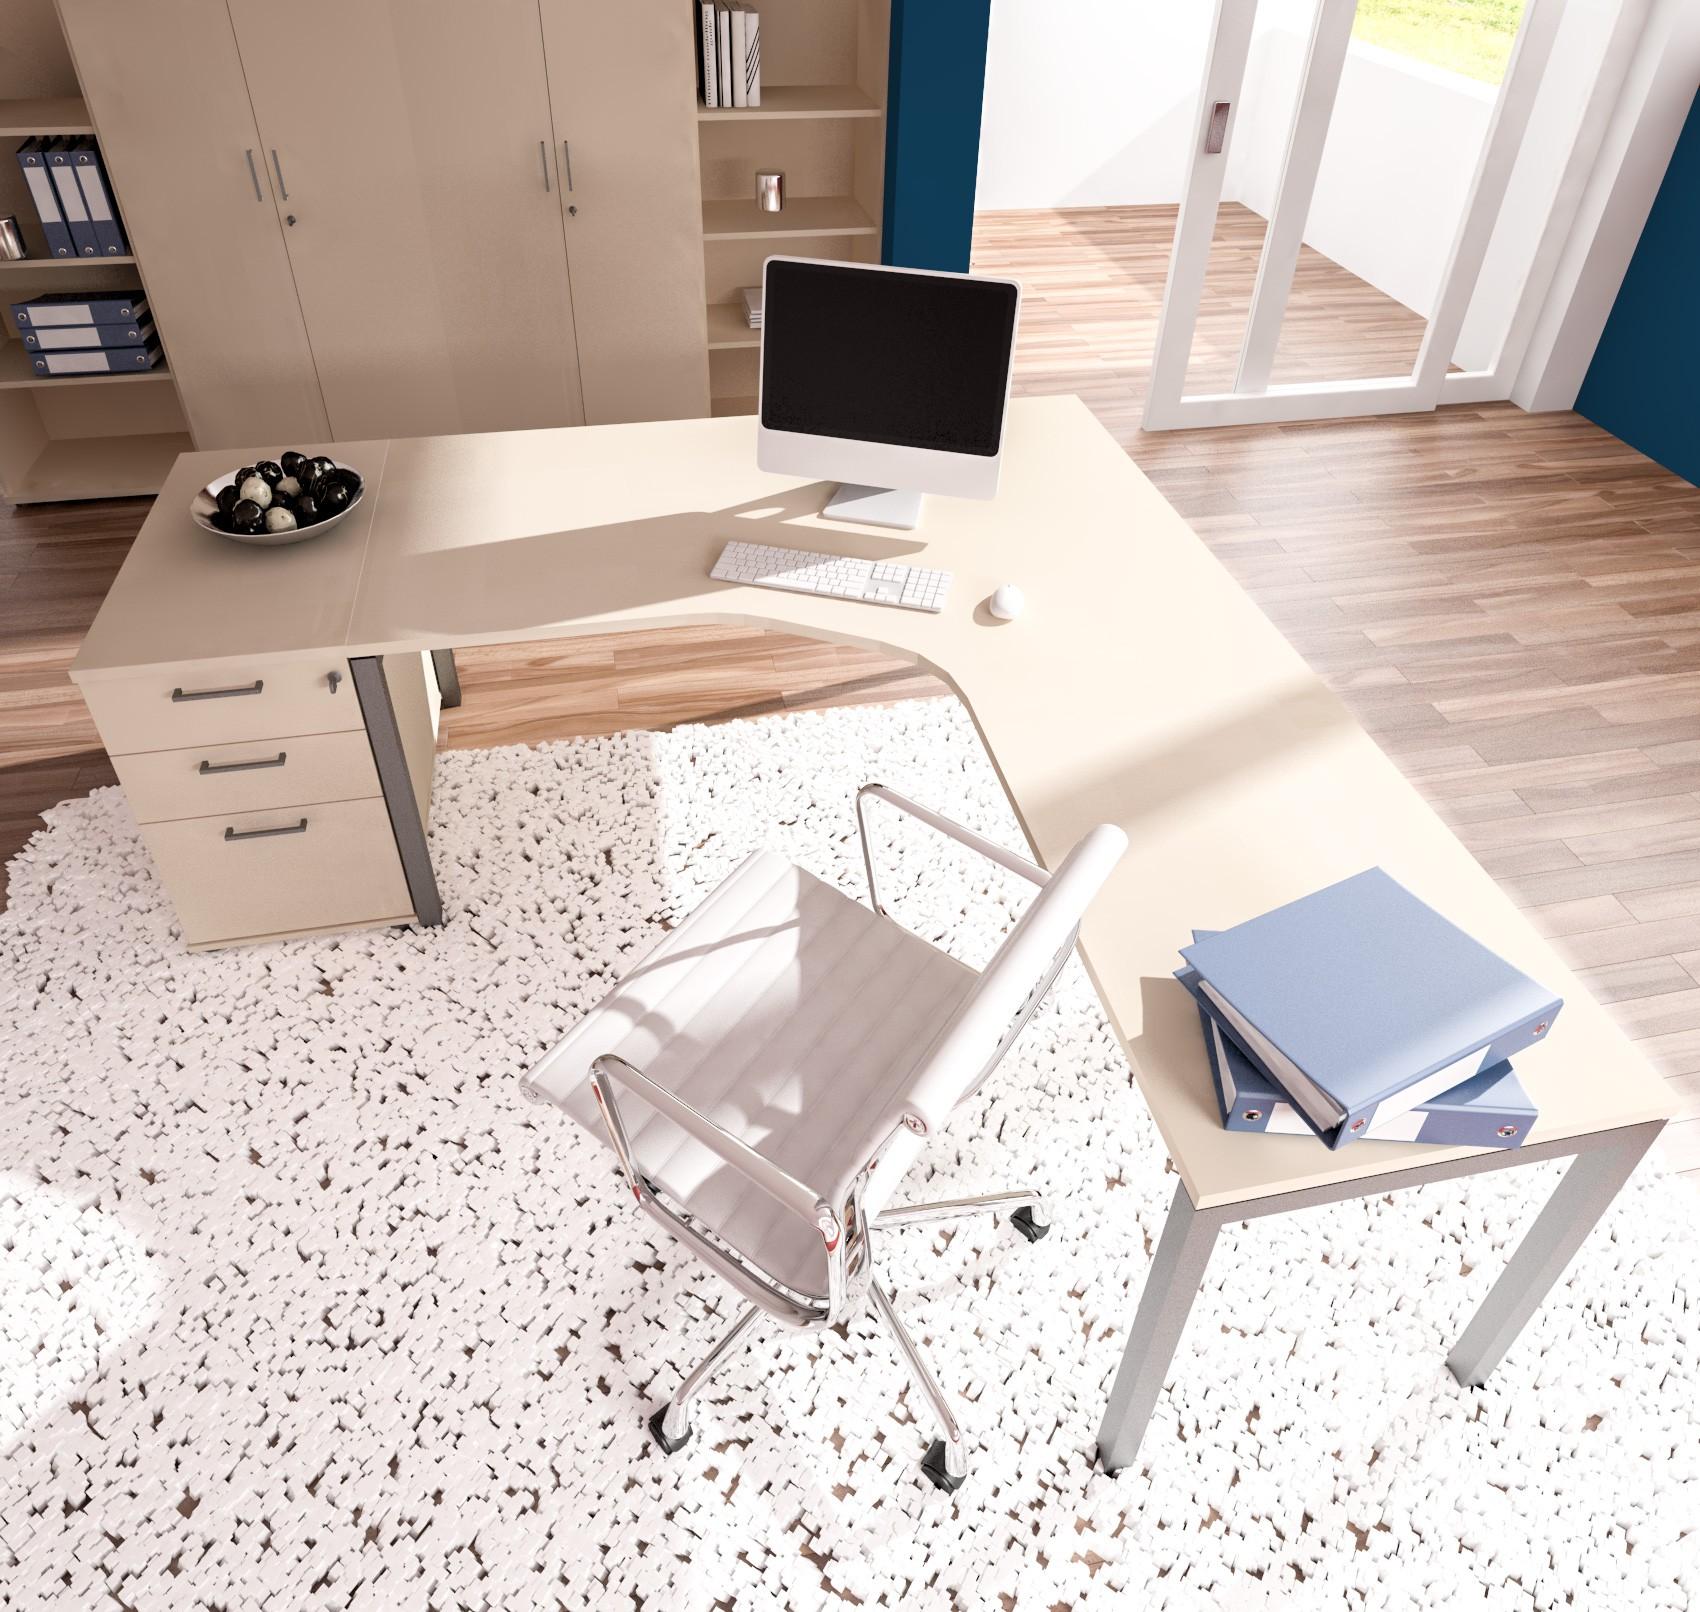 PROFI-Komplettbüro NOVA München in Ahorn Homeoffice Komplettset Cheffbüro